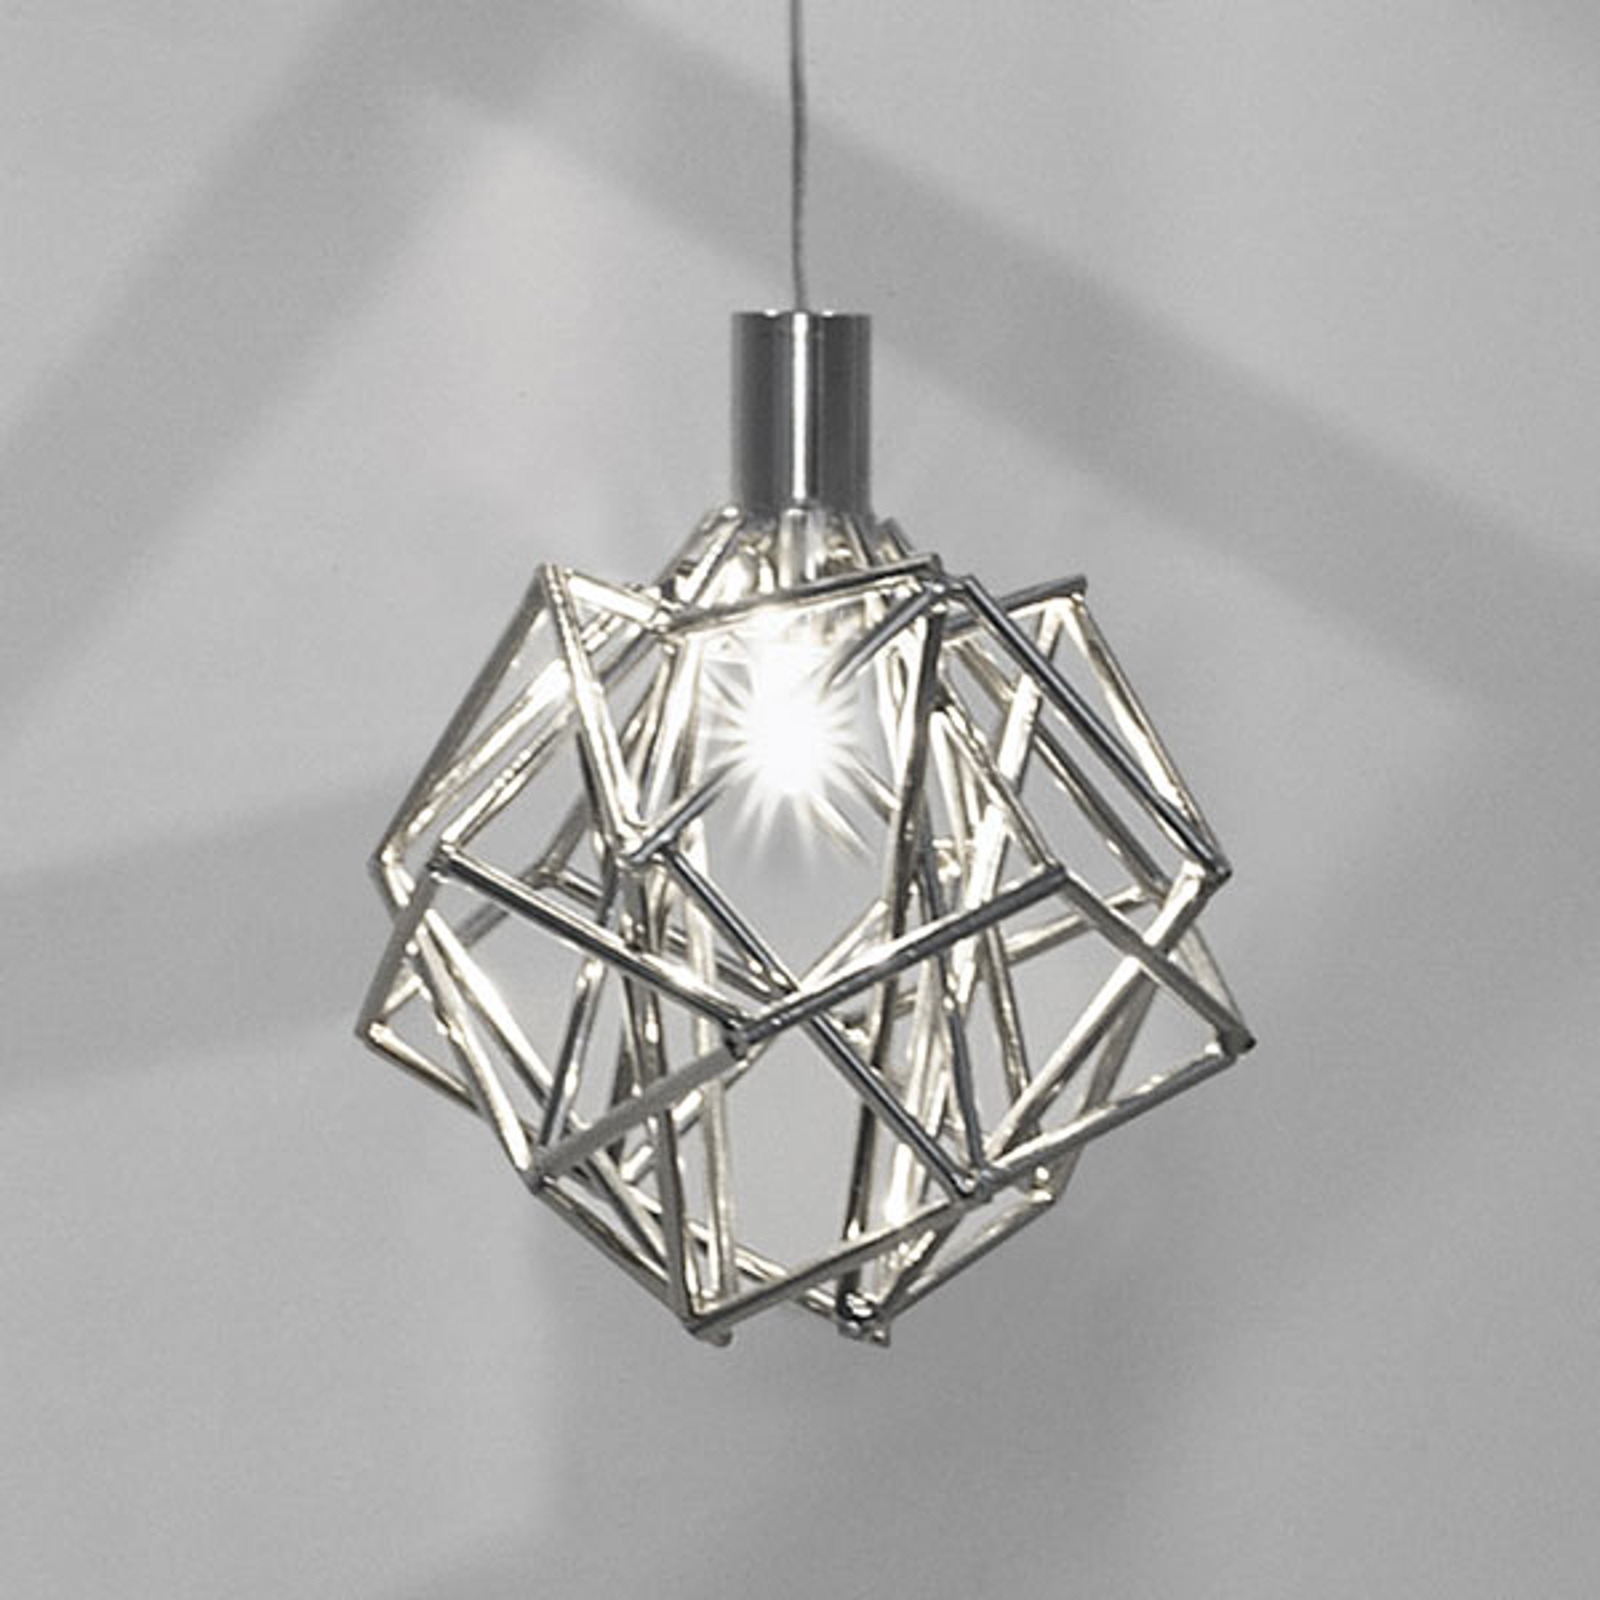 Terzani Etoile designer-hengelampe 1 lyskilde